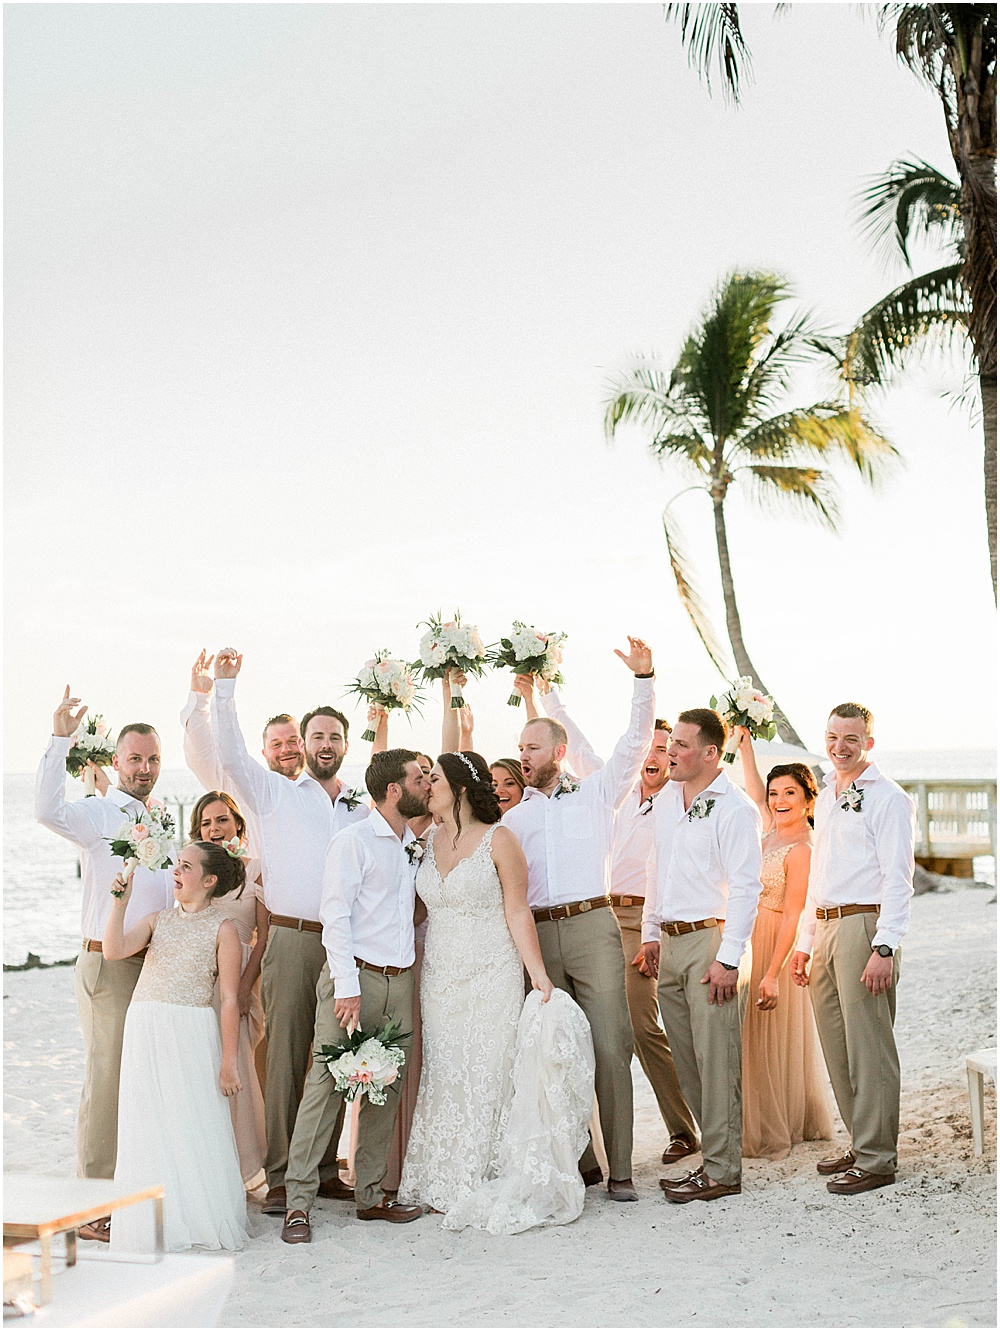 casa_marina_key_west_florida_destination_palm_trees_boston_wedding_photographer_meredith_jane_photography_photo_0107.jpg